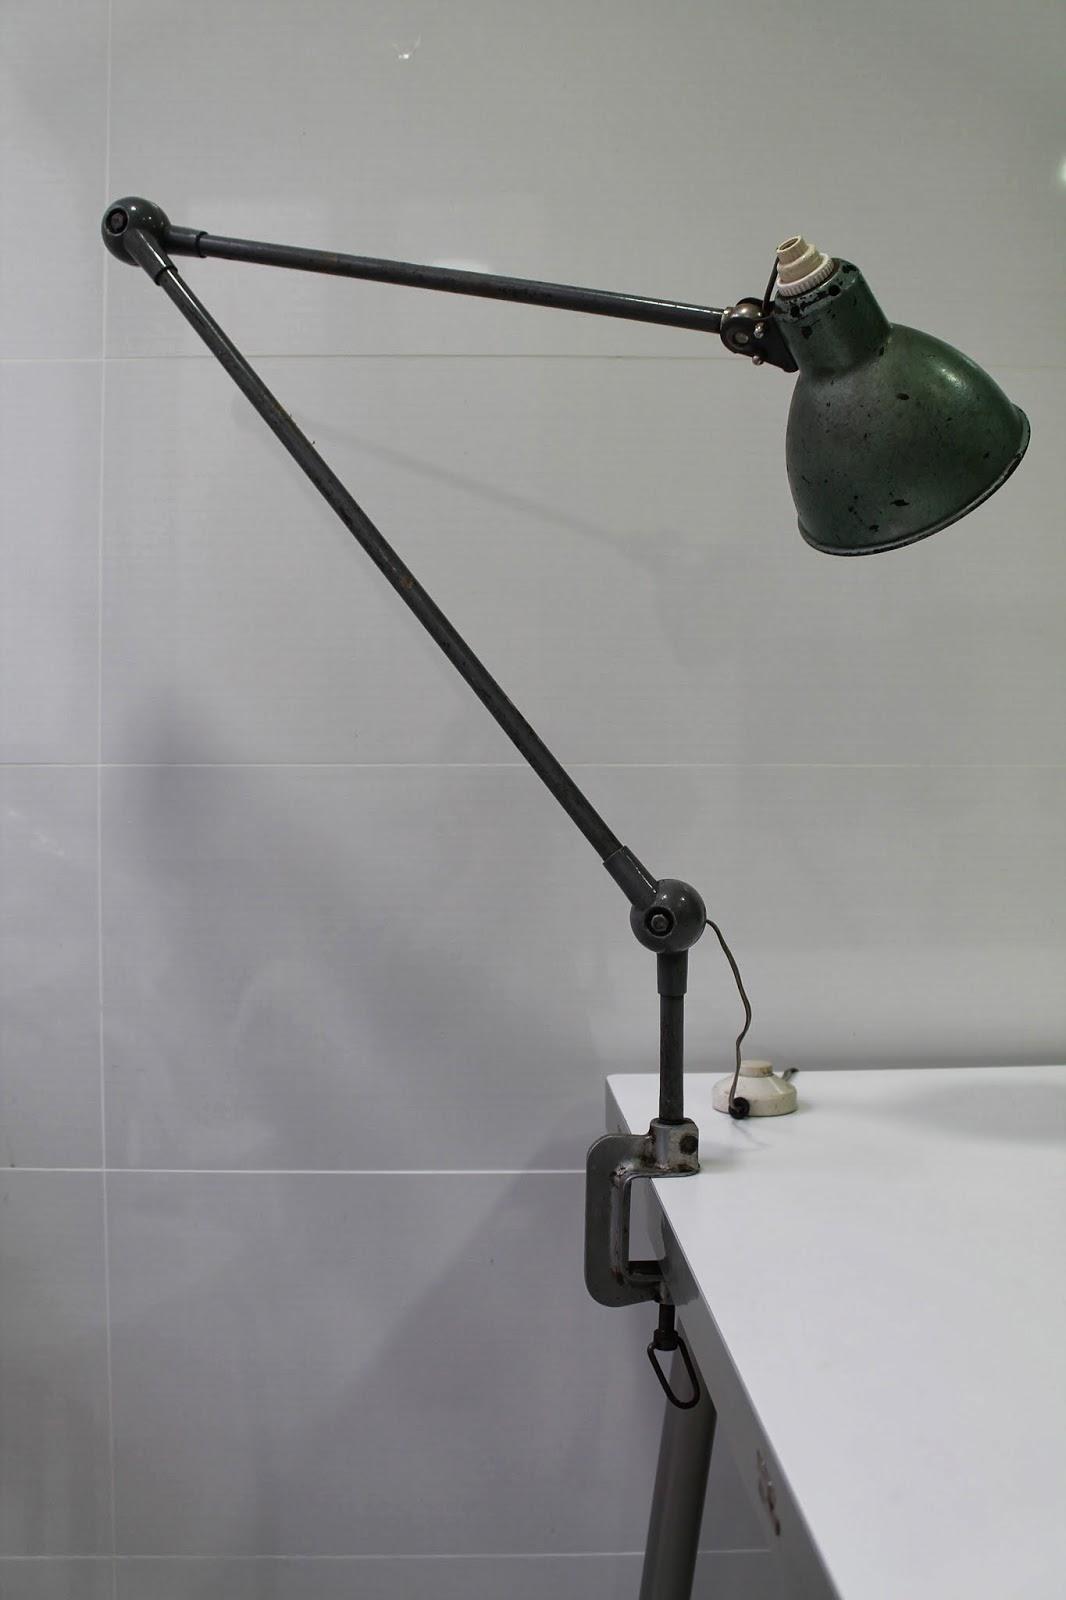 Vintager a lampara industrial o arquitecto tipo jielde a os 50 - Lampara tipo industrial ...